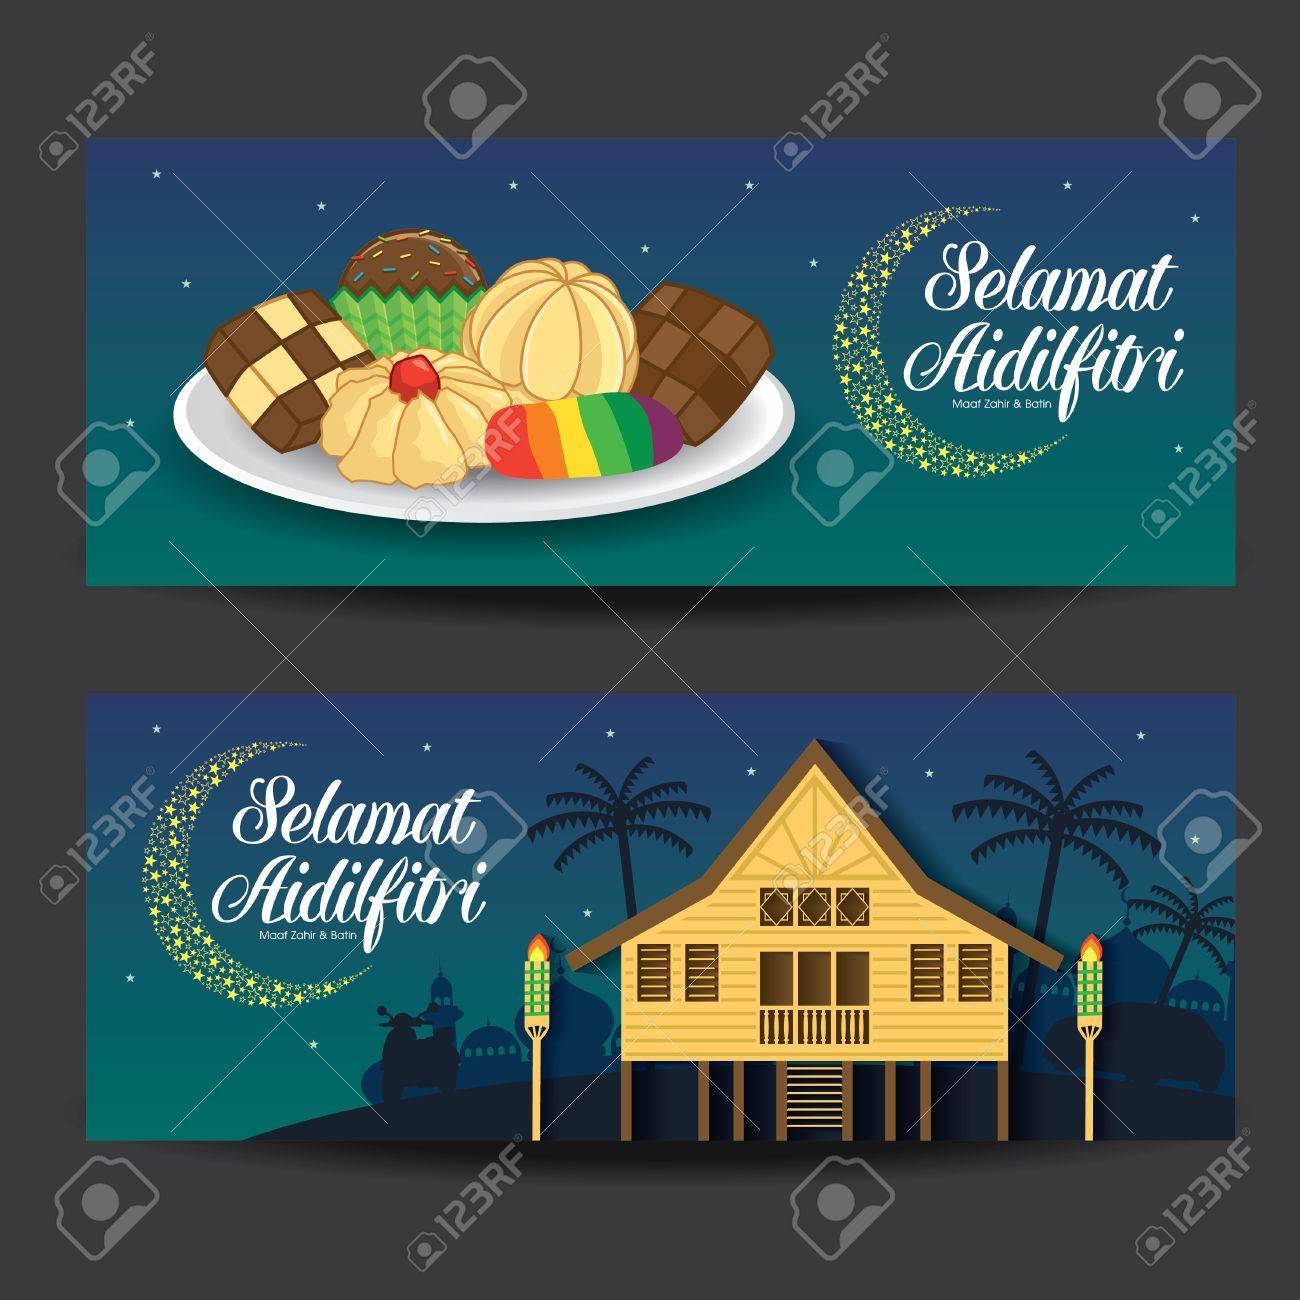 Selamat Hari Raya Aidilfitri vector illustration with traditional malay village house / Kampung & kuih raya. Caption: Fasting Day of Celebration - 80112864